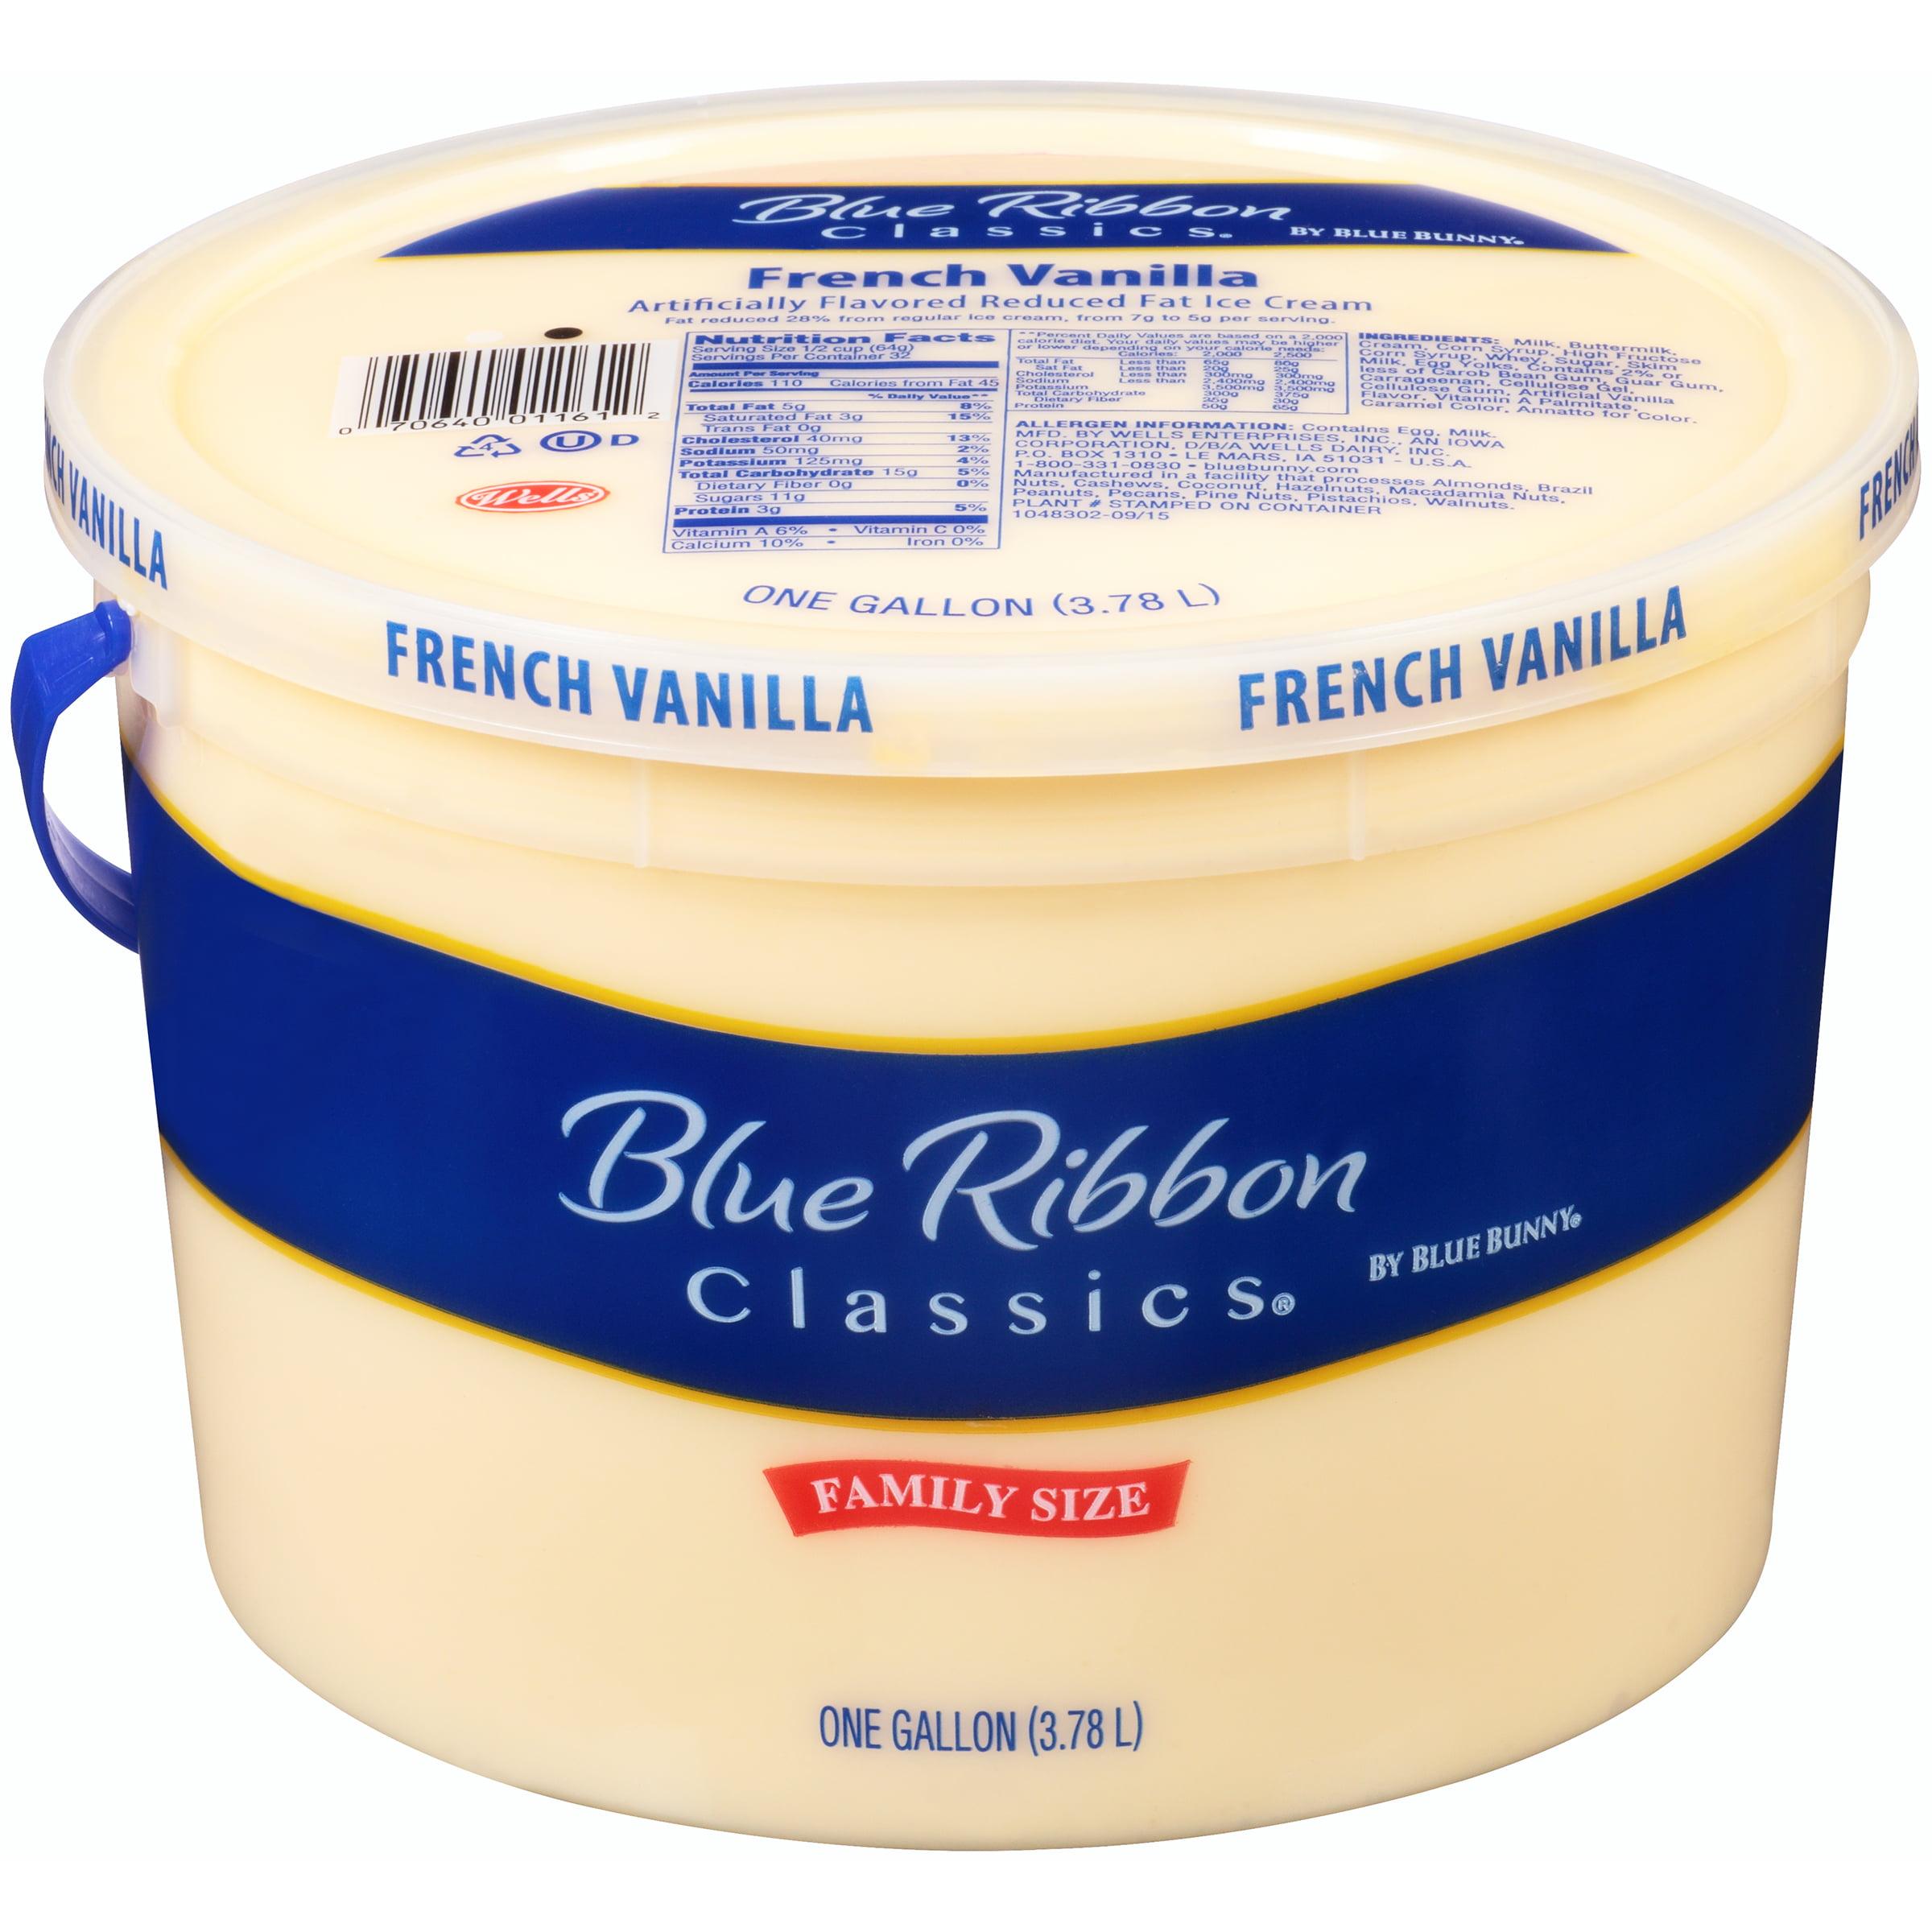 Blue Bunny® Blue Ribbon Classics® French Vanilla Reduced Fat Ice Cream 1 gal. Tub